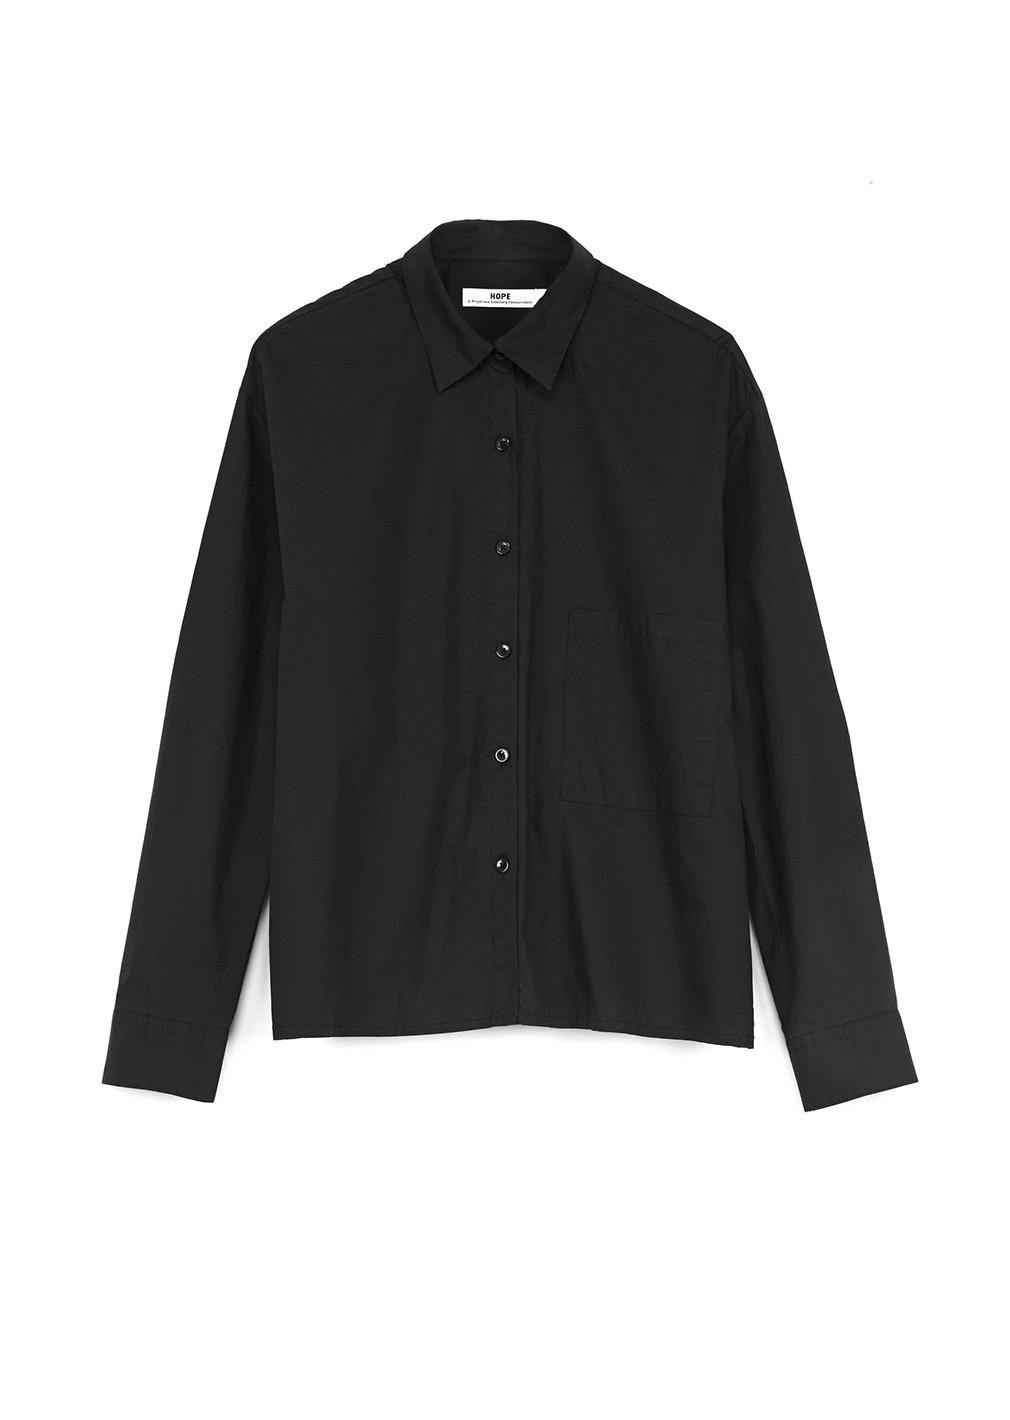 hope-ester-blouse-black-front